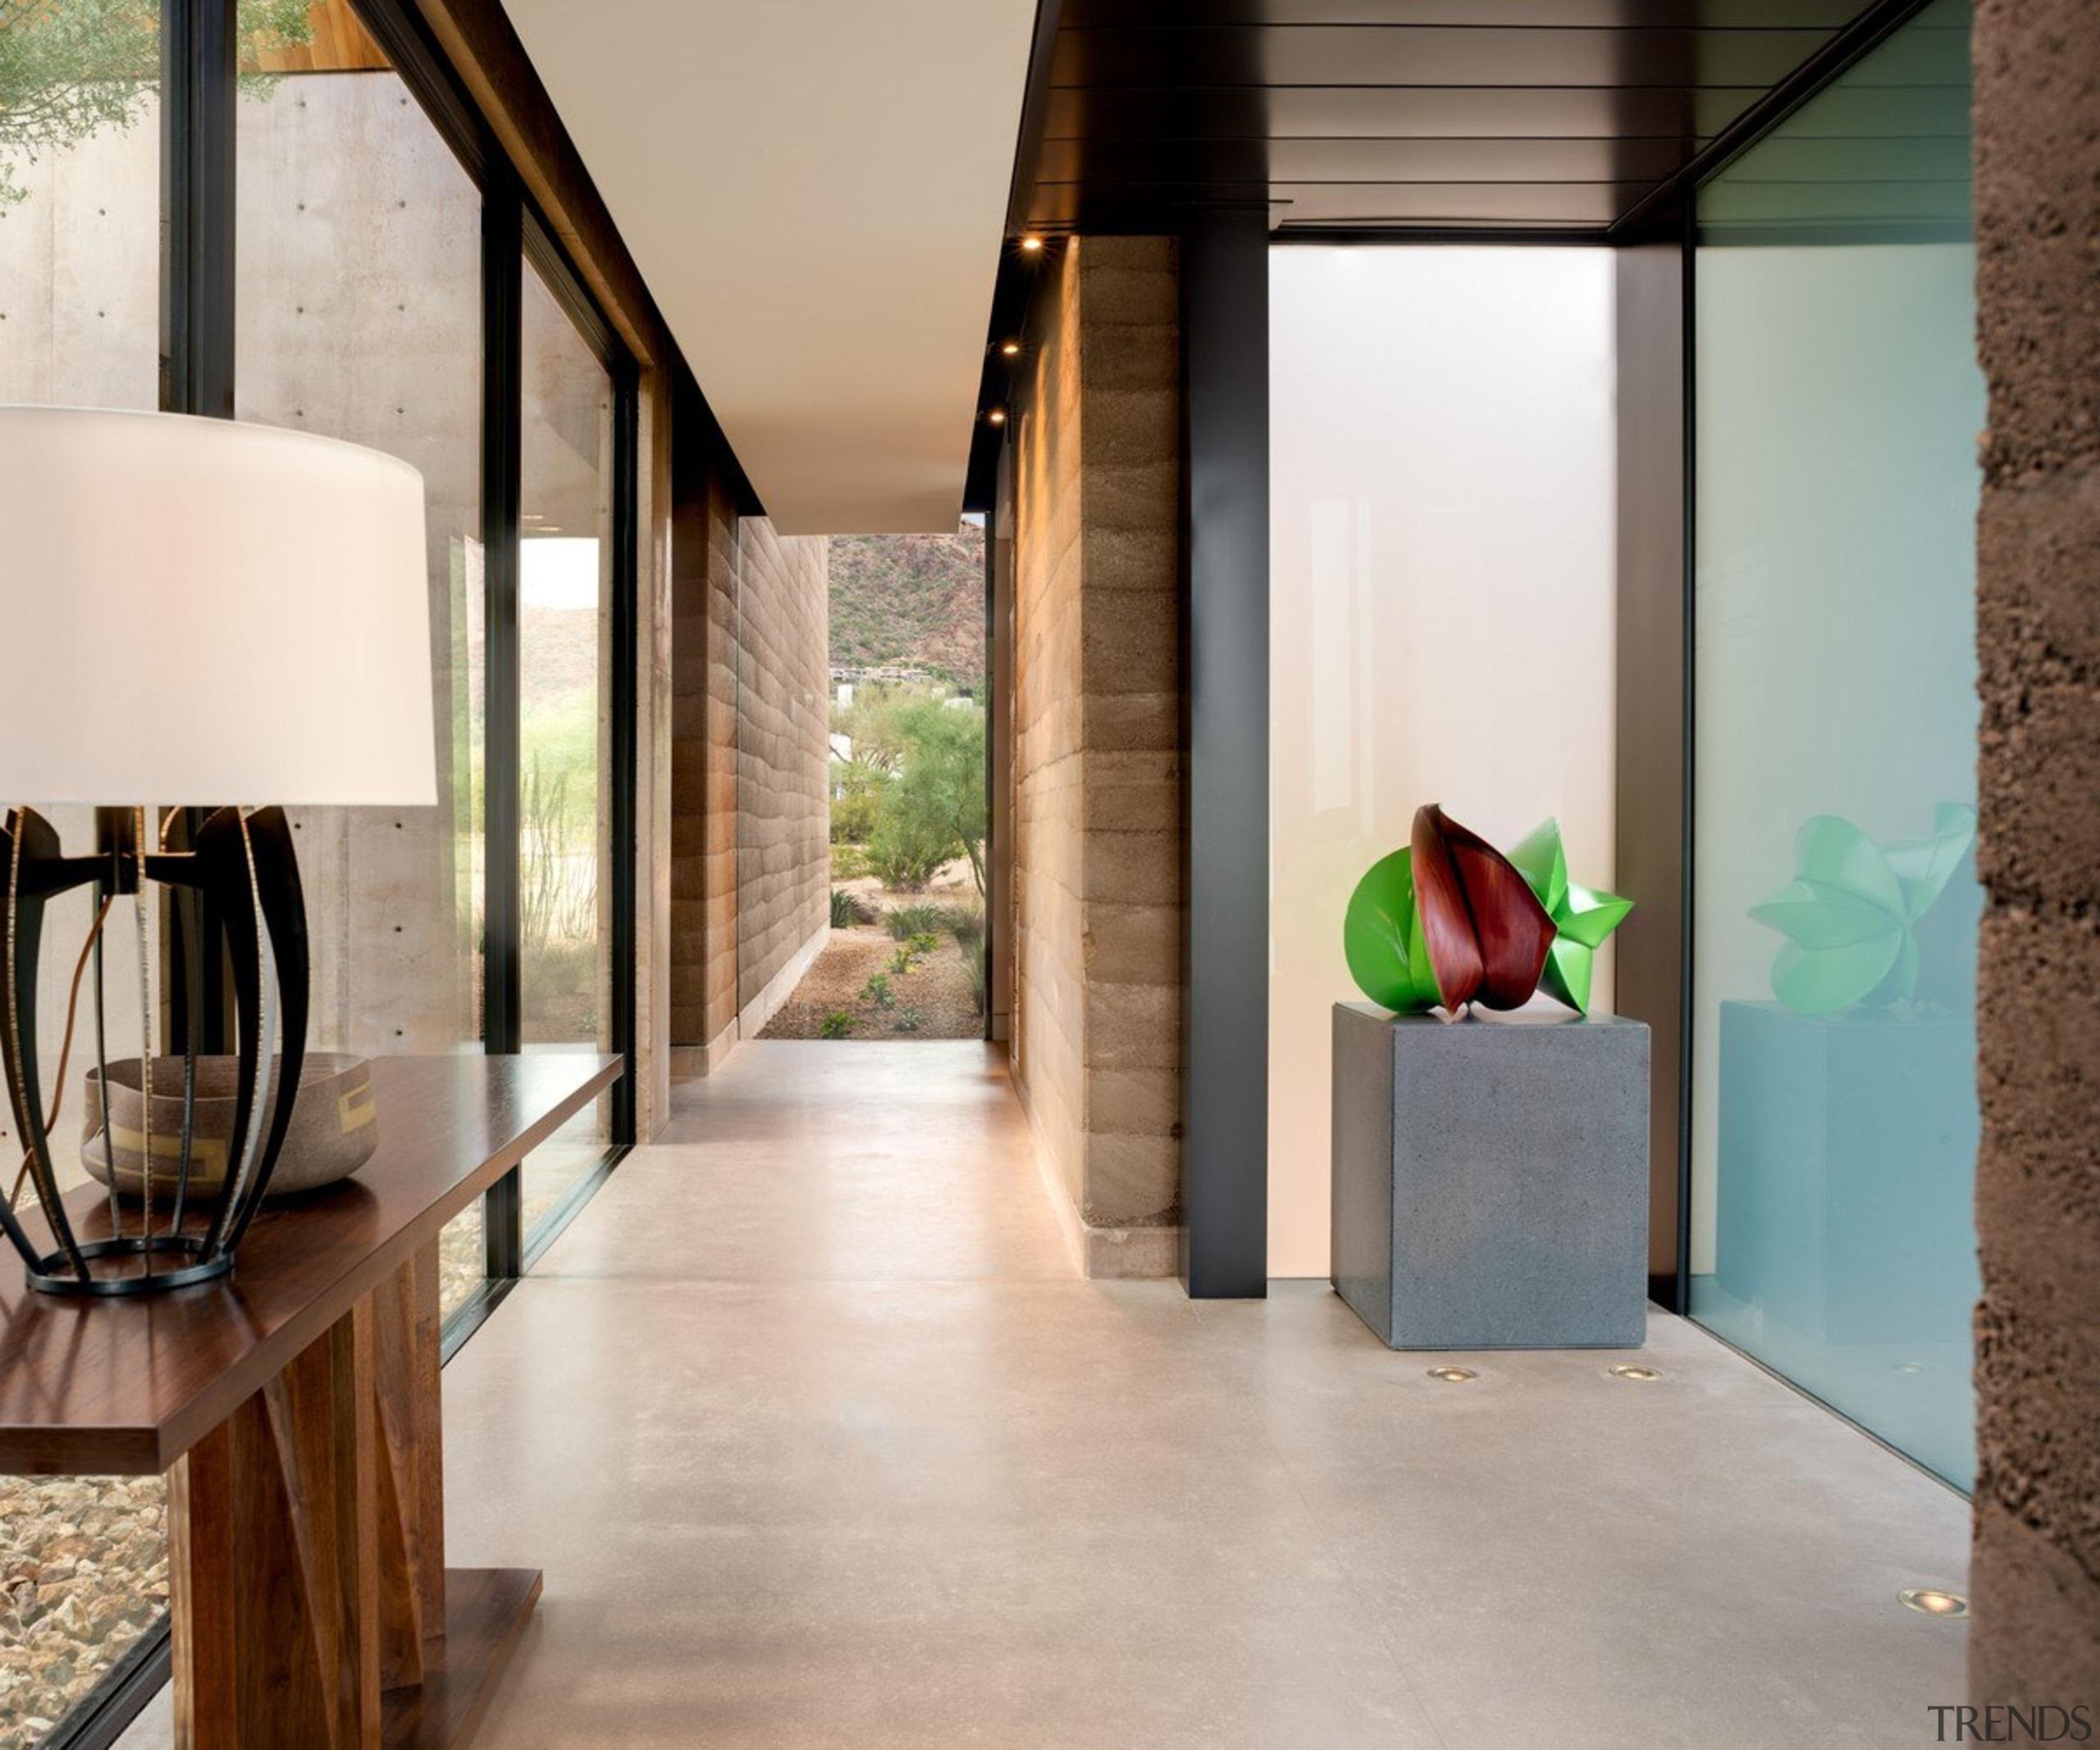 Dancing Light House Kendle Design Collaborative11 - architecture architecture, floor, flooring, house, interior design, gray